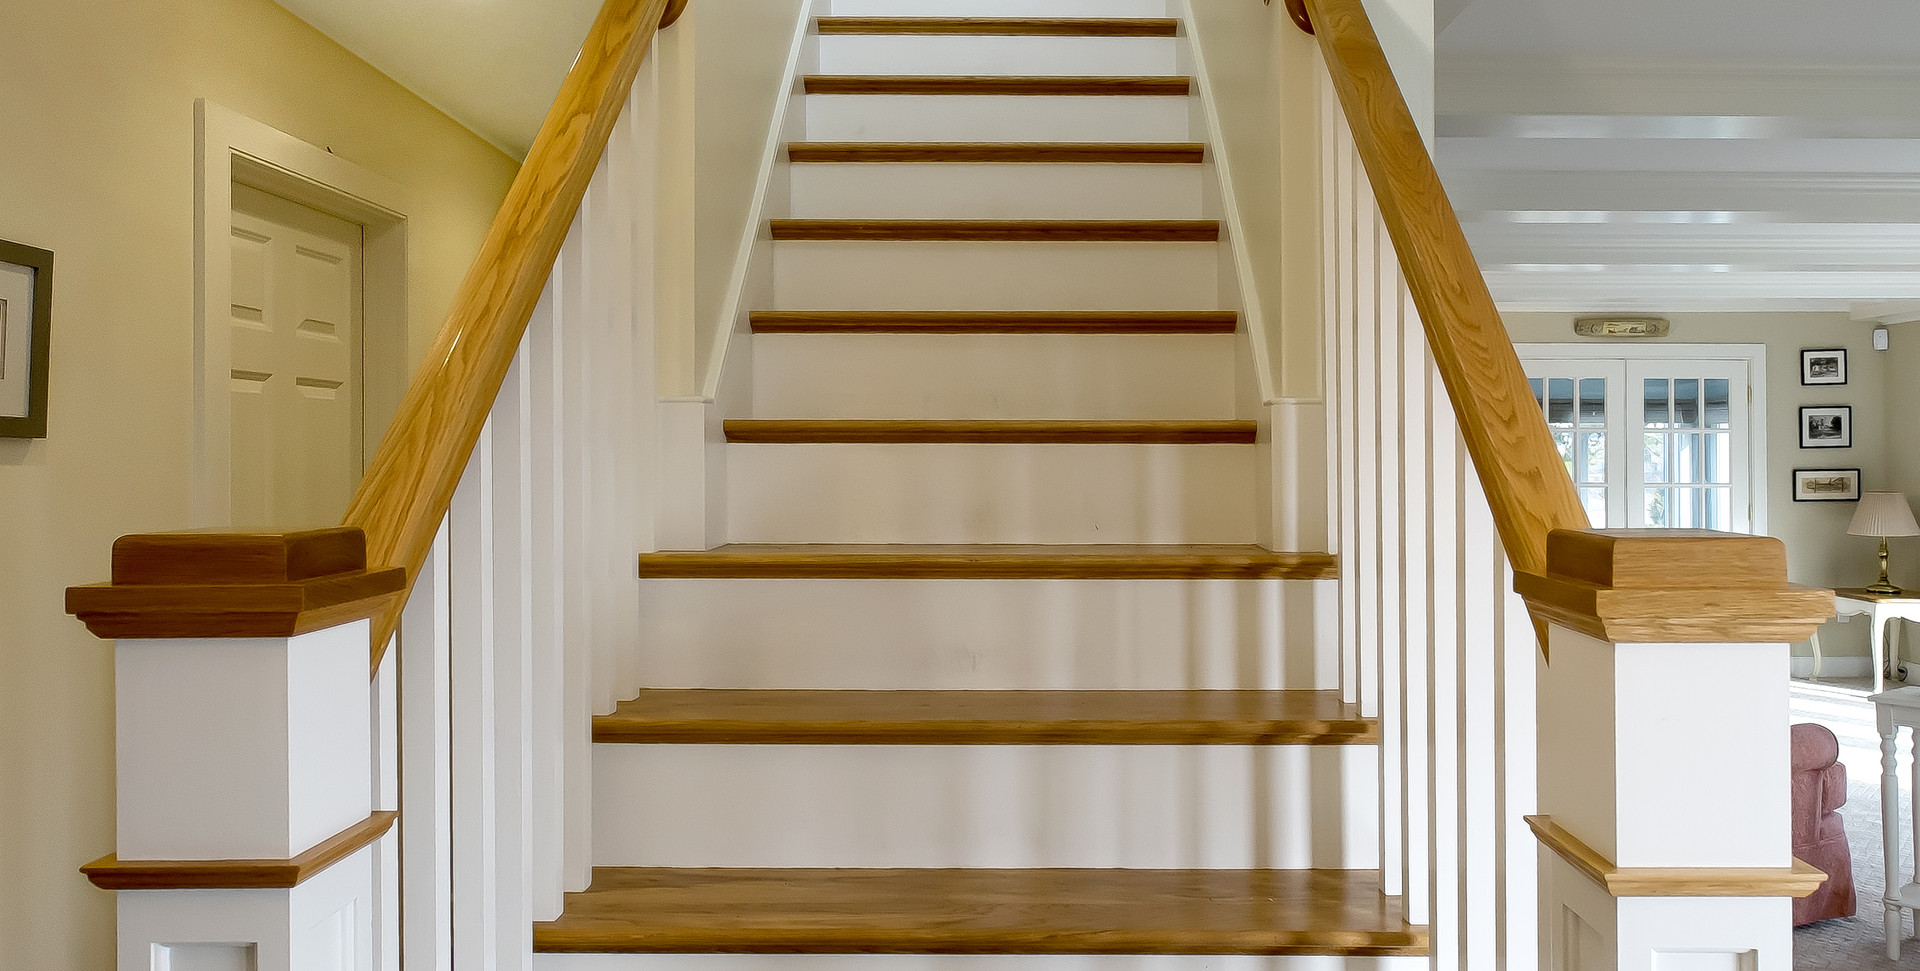 Ridgevale Beach, West Chatham, MA, Home Remodel, custom staircase